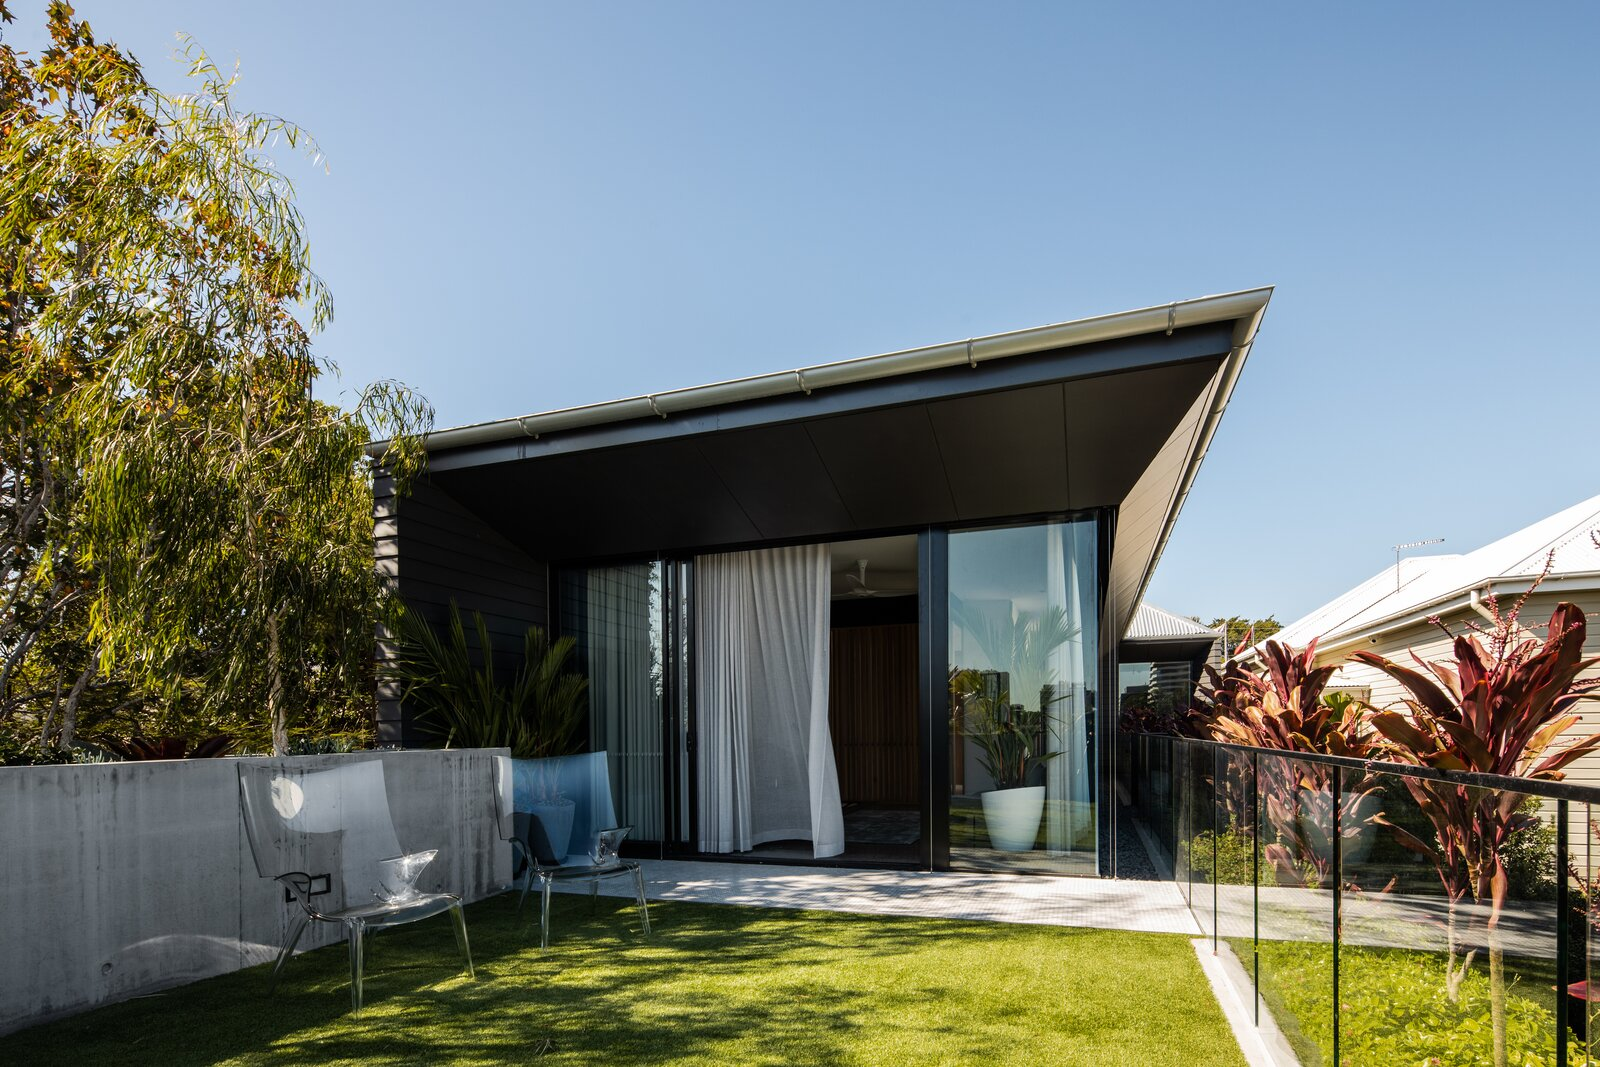 Danny's House Shaun Lockyer Architects roof terrace